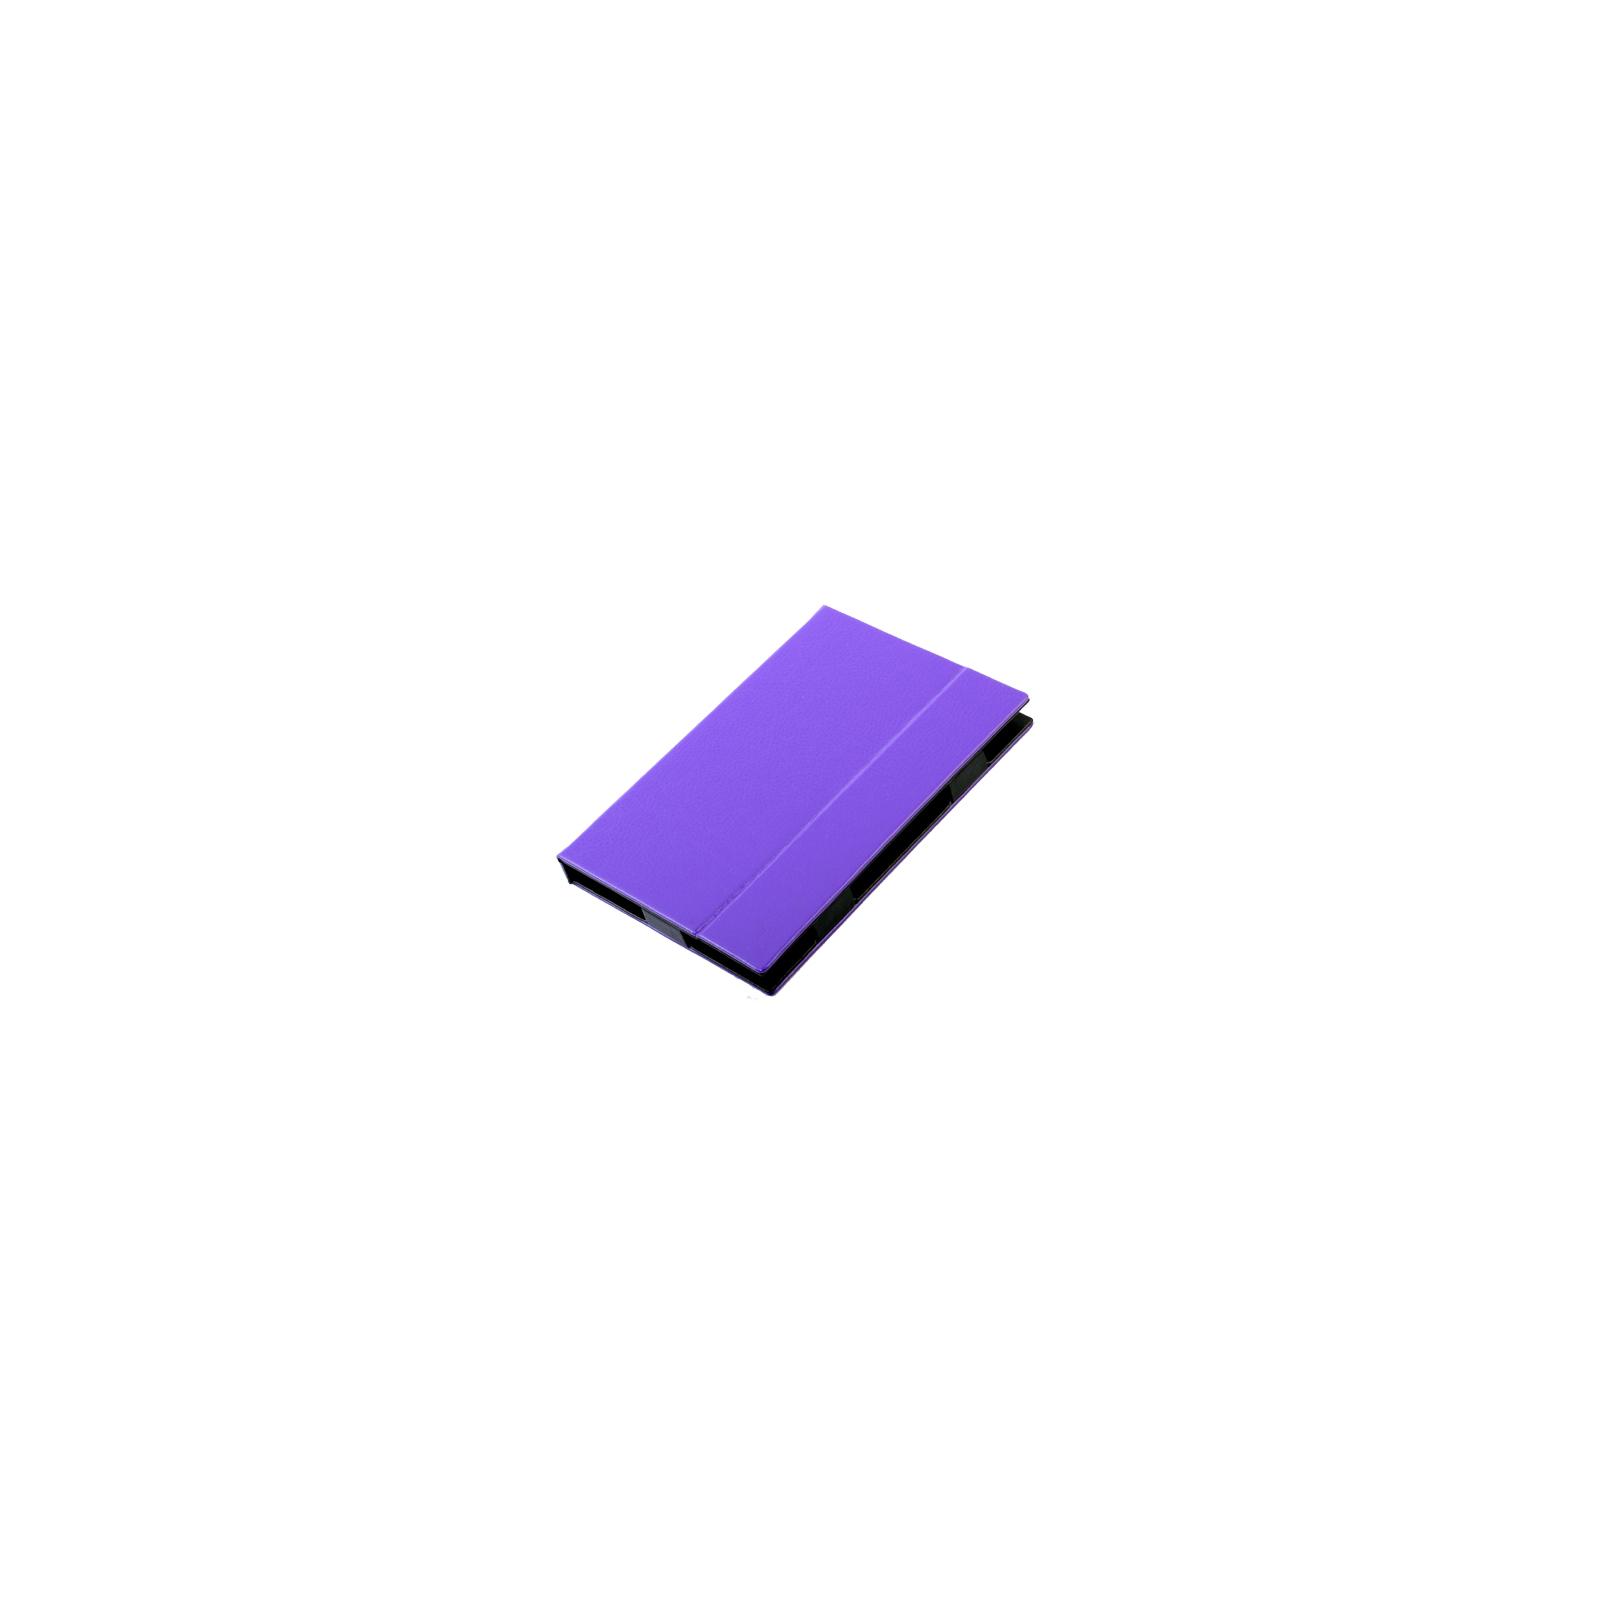 Чехол для планшета Vento 7 Desire Bright - purple